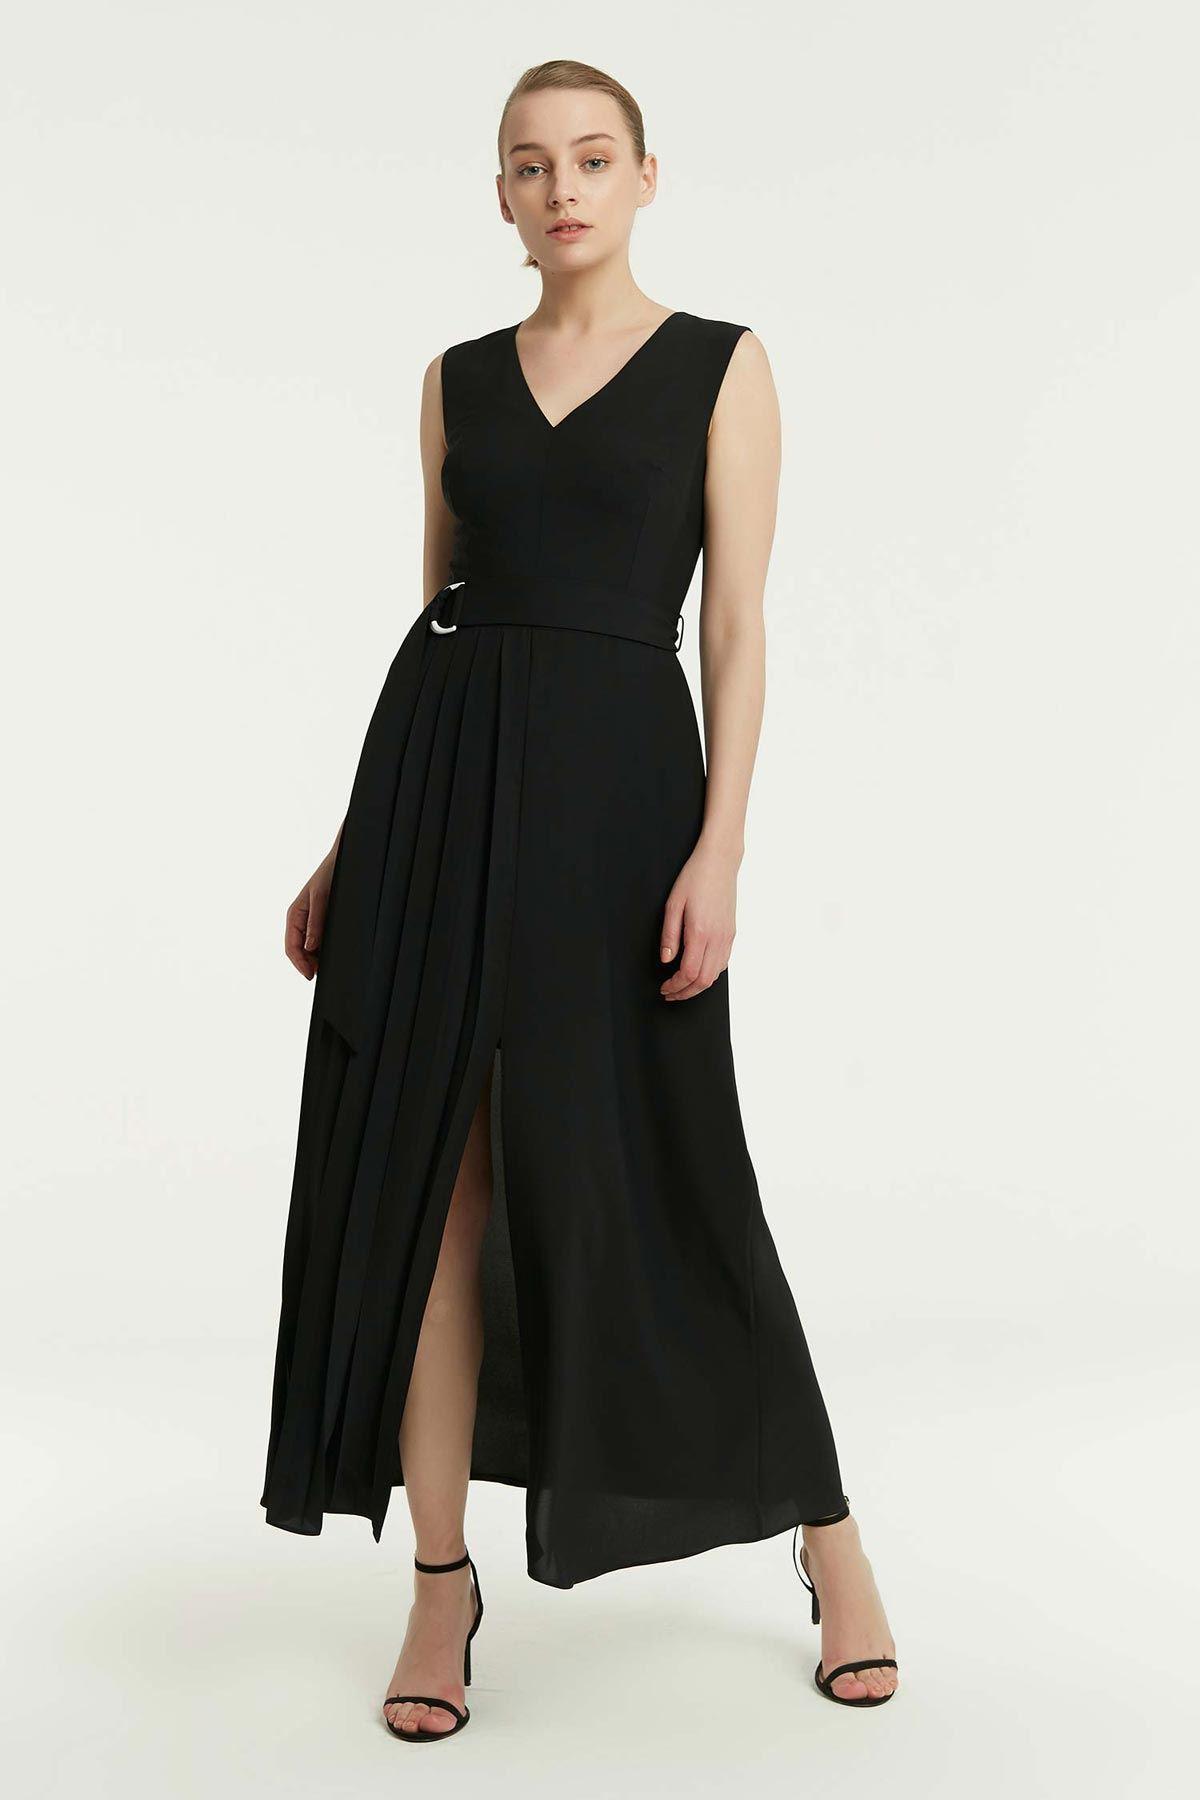 Yan Piliseli Kolsuz Elbise Siyah